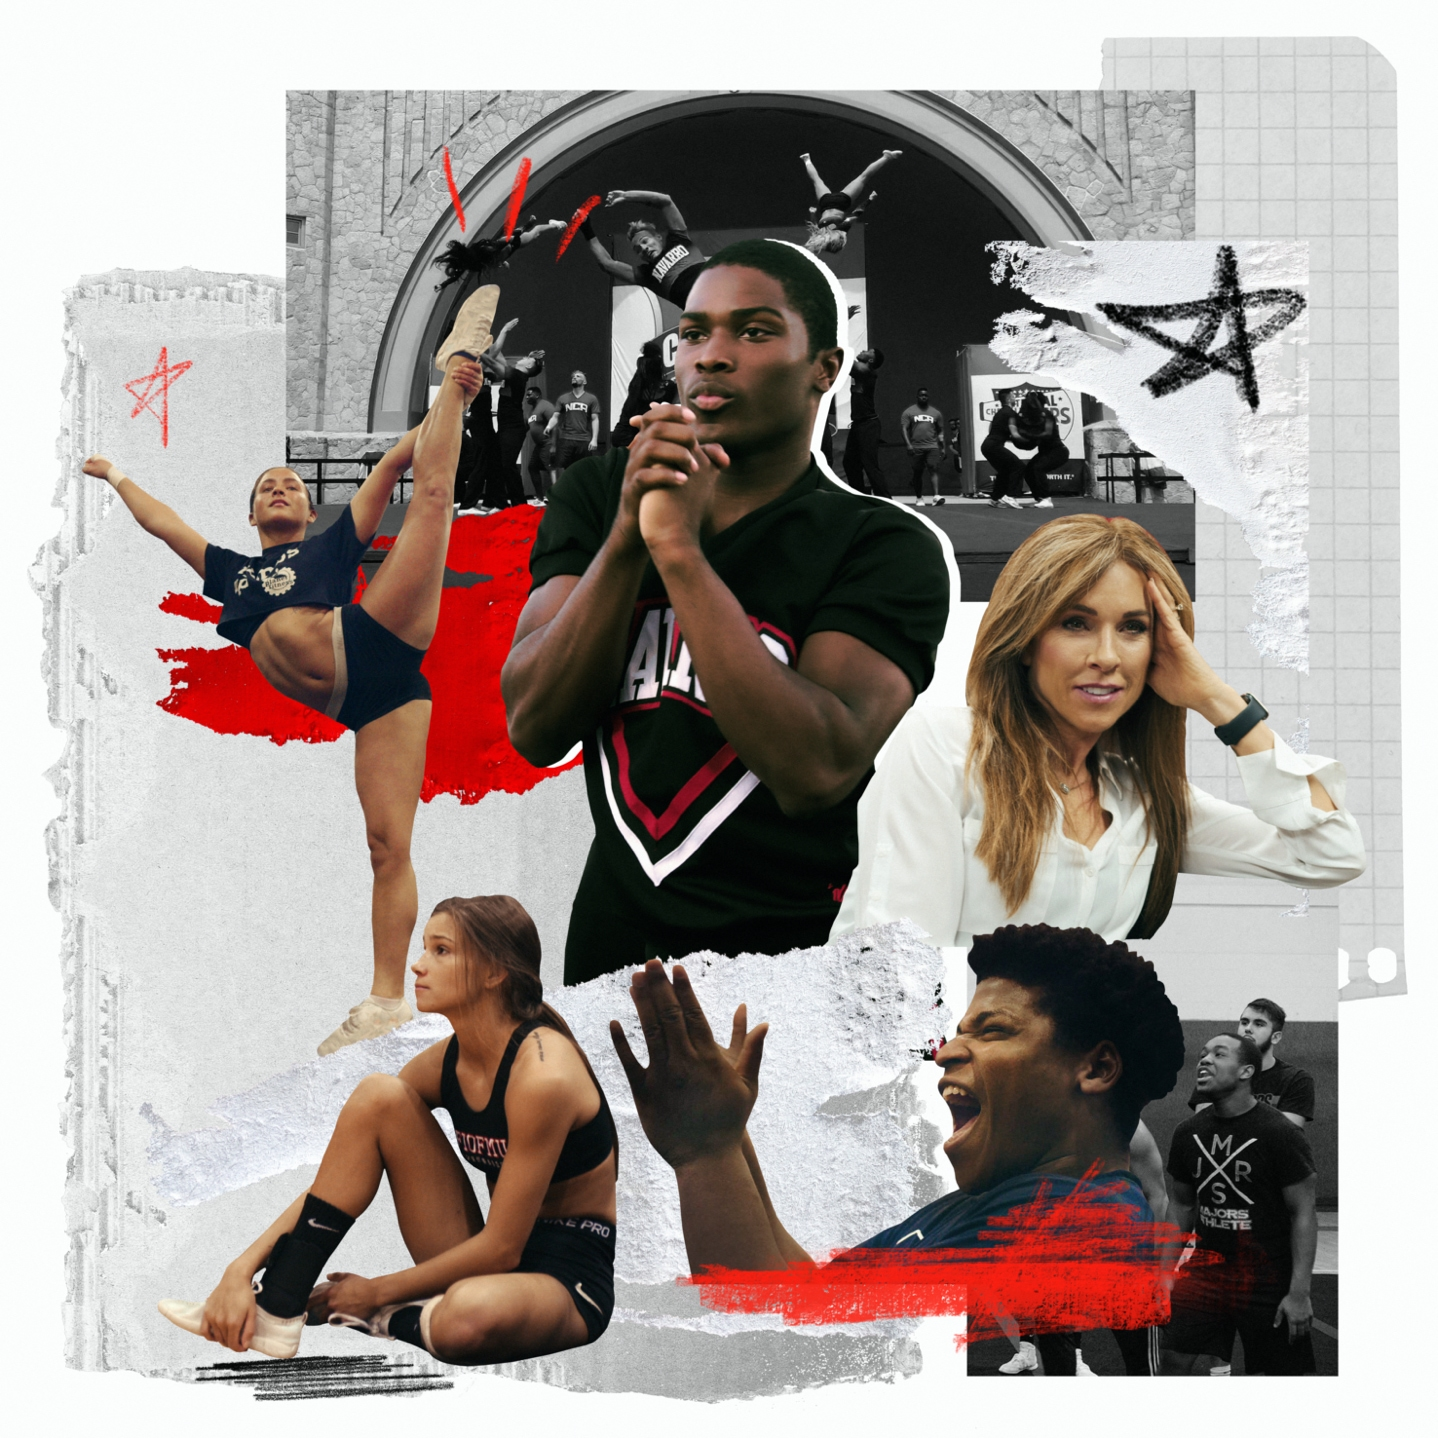 The stars of the documentary series Cheer